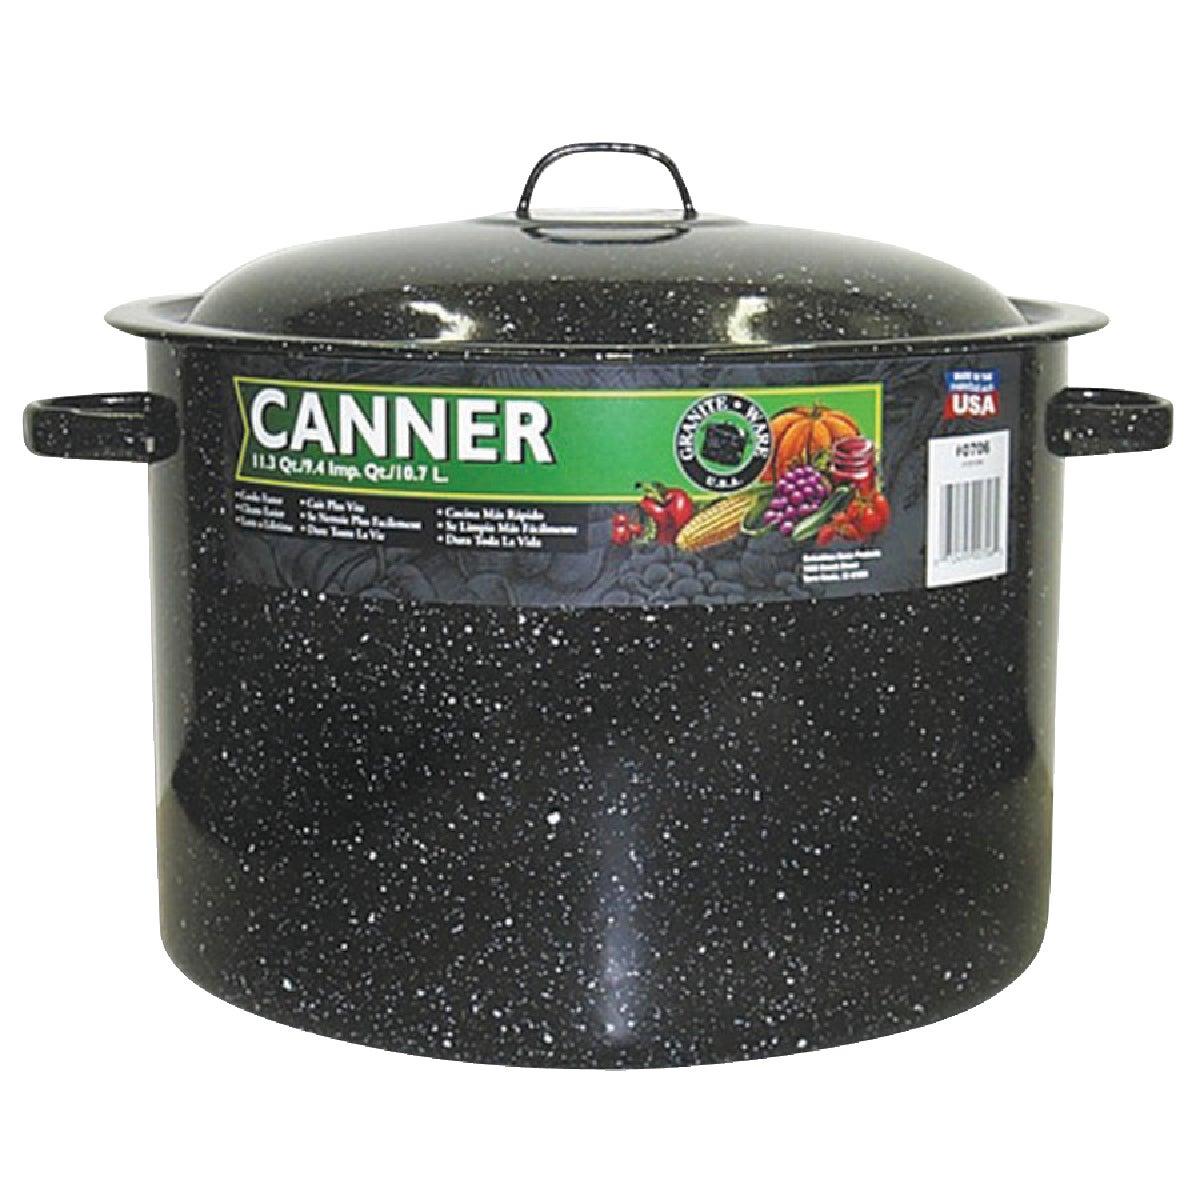 11.5QT PORCELAIN CANNER